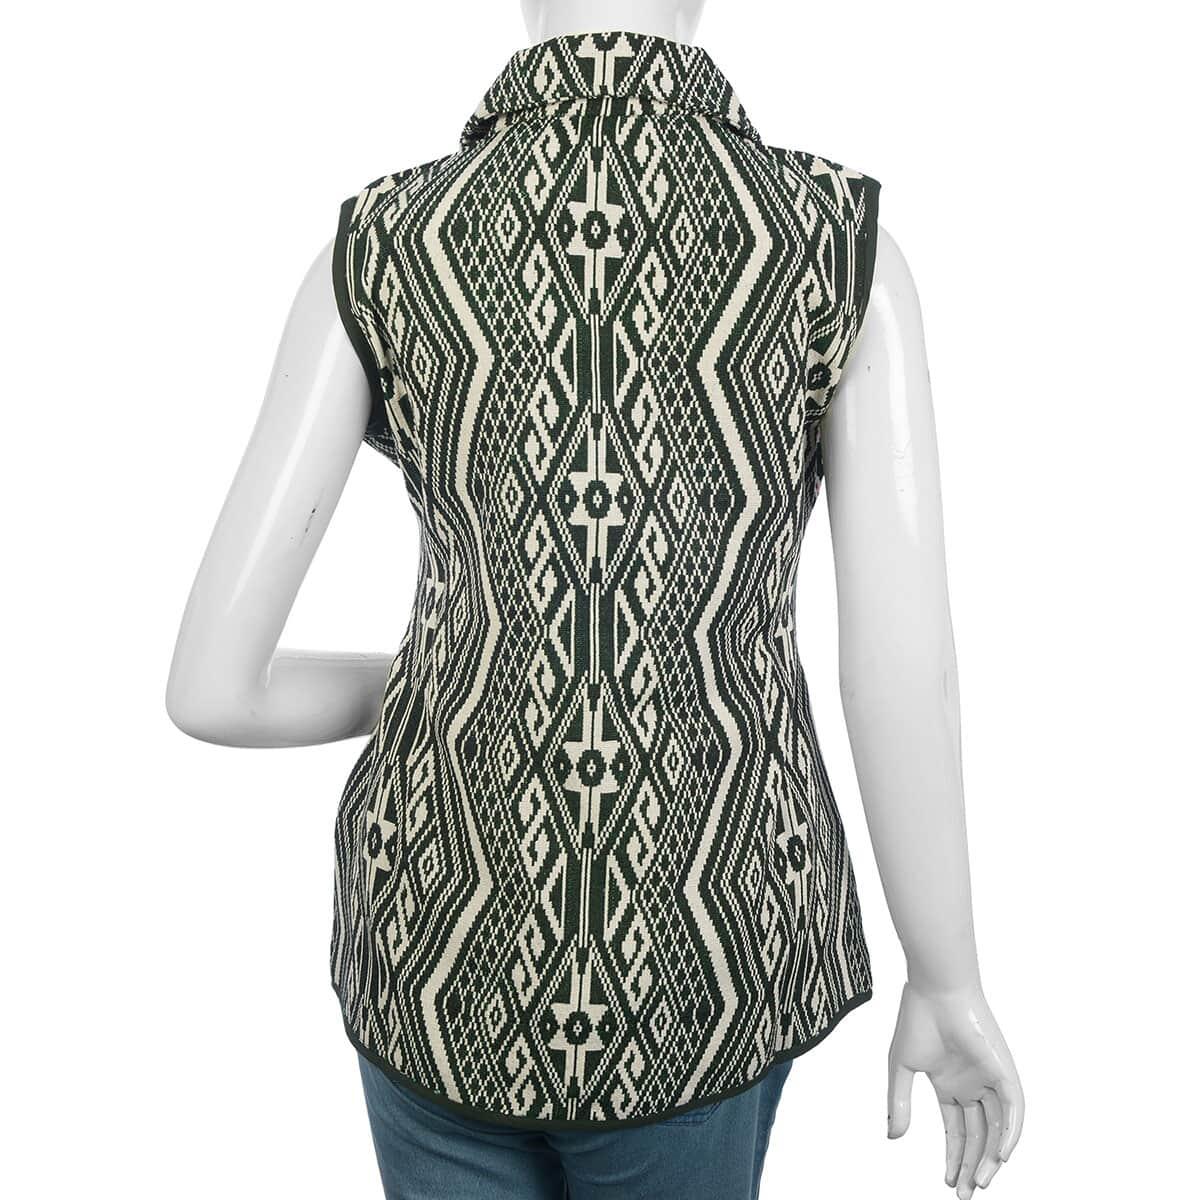 Green Geometric Woven Pattern Jacket - XL (27x47, 100% Polyester/Cotton)